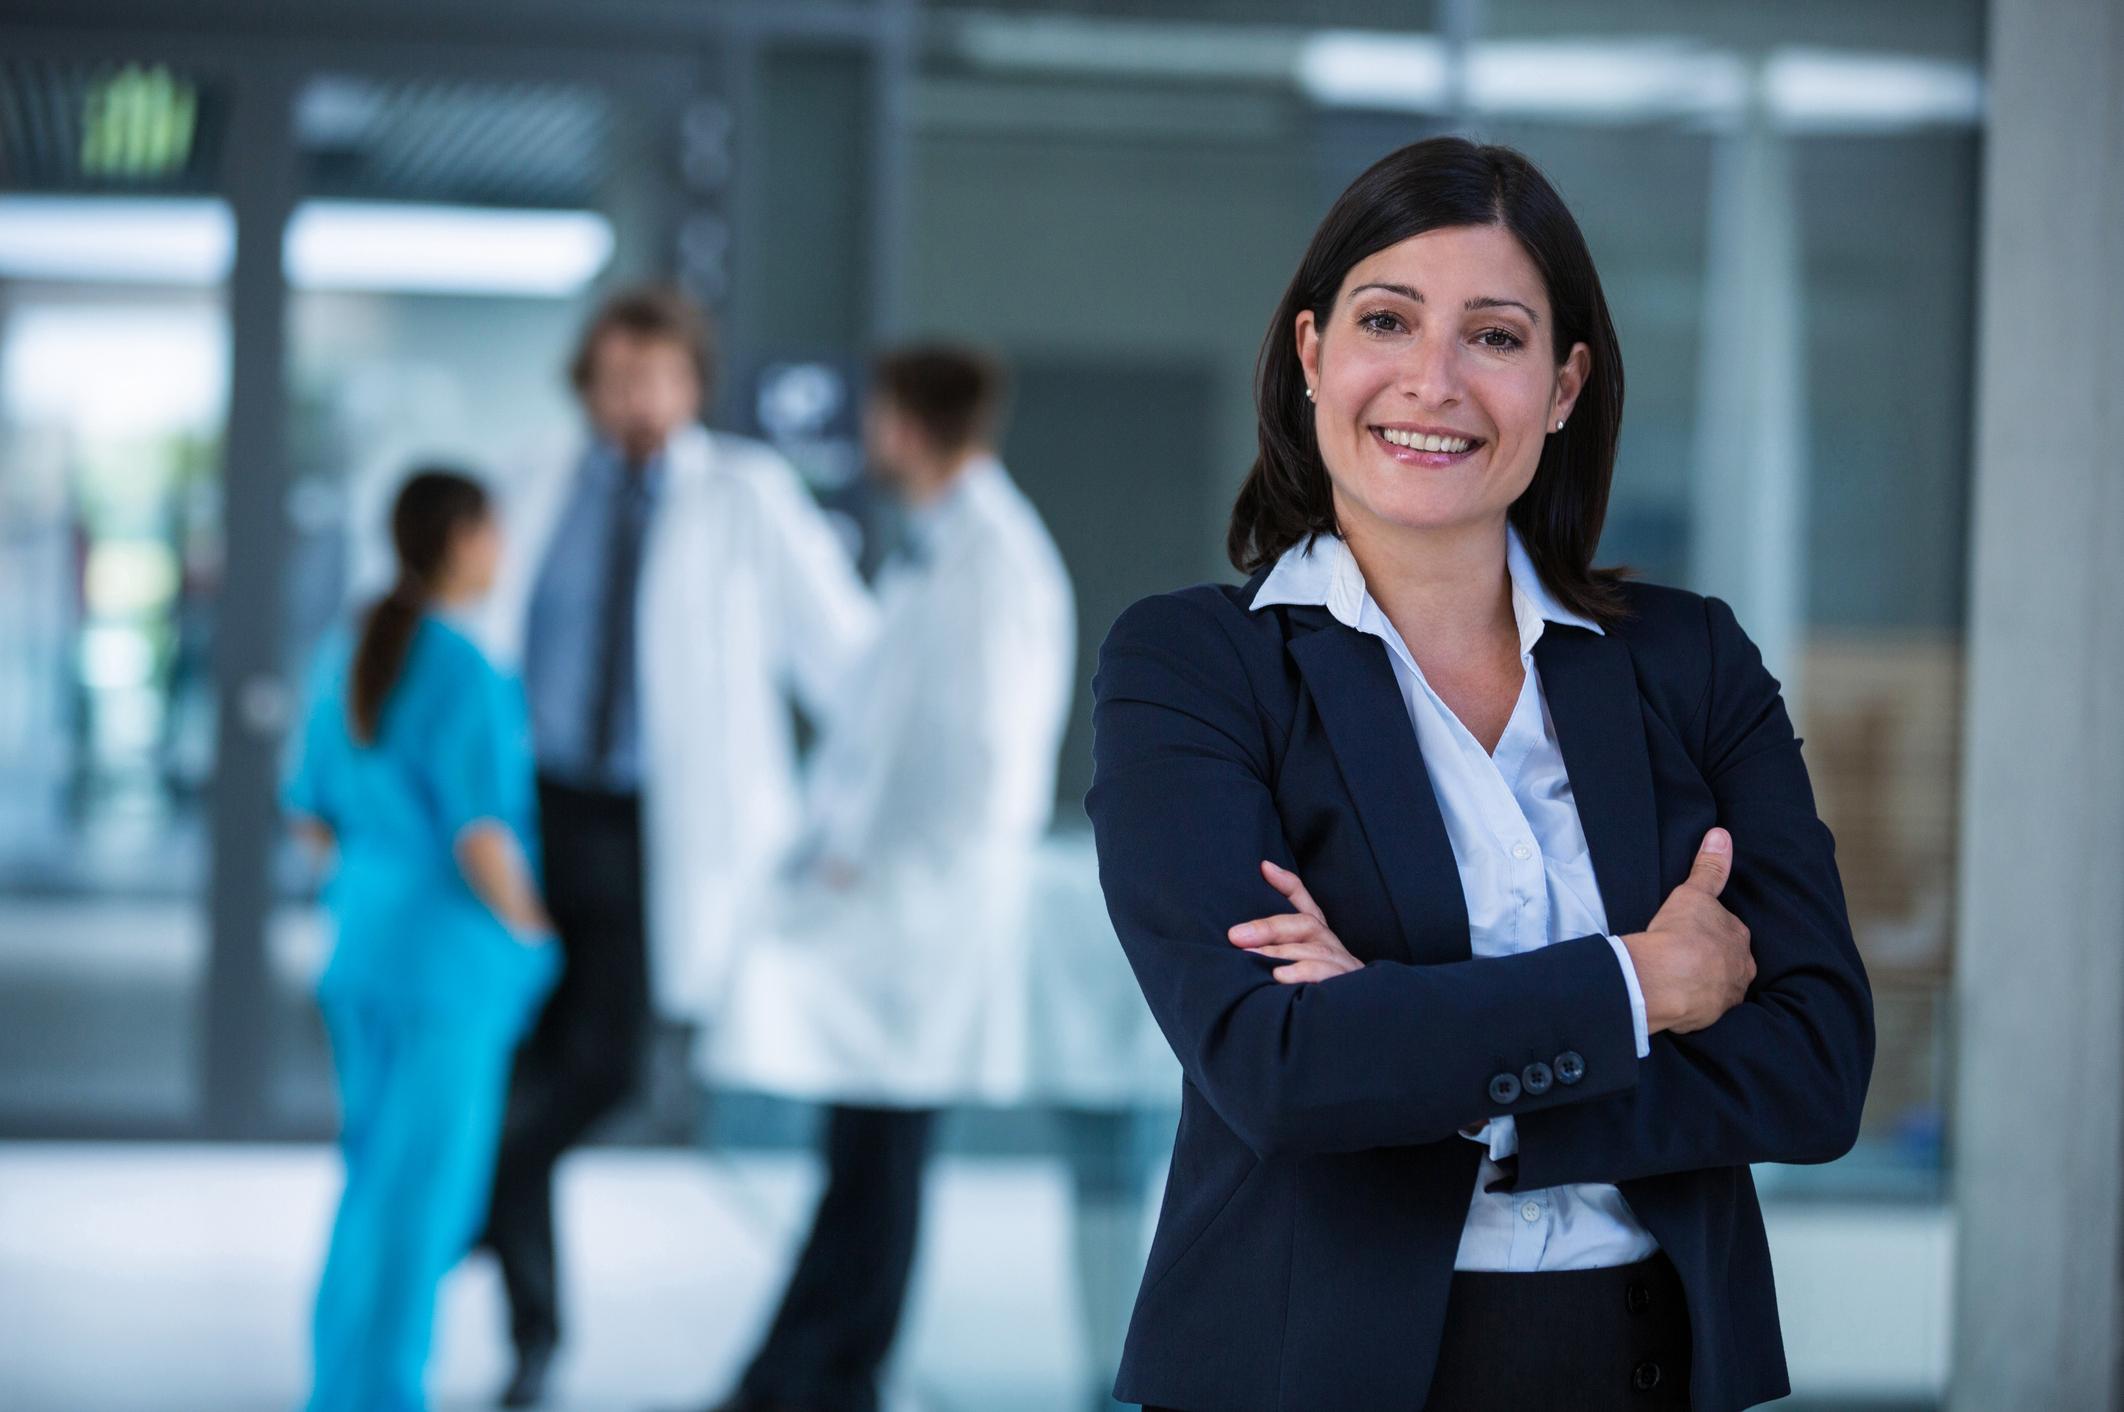 MedTech Sales Rep